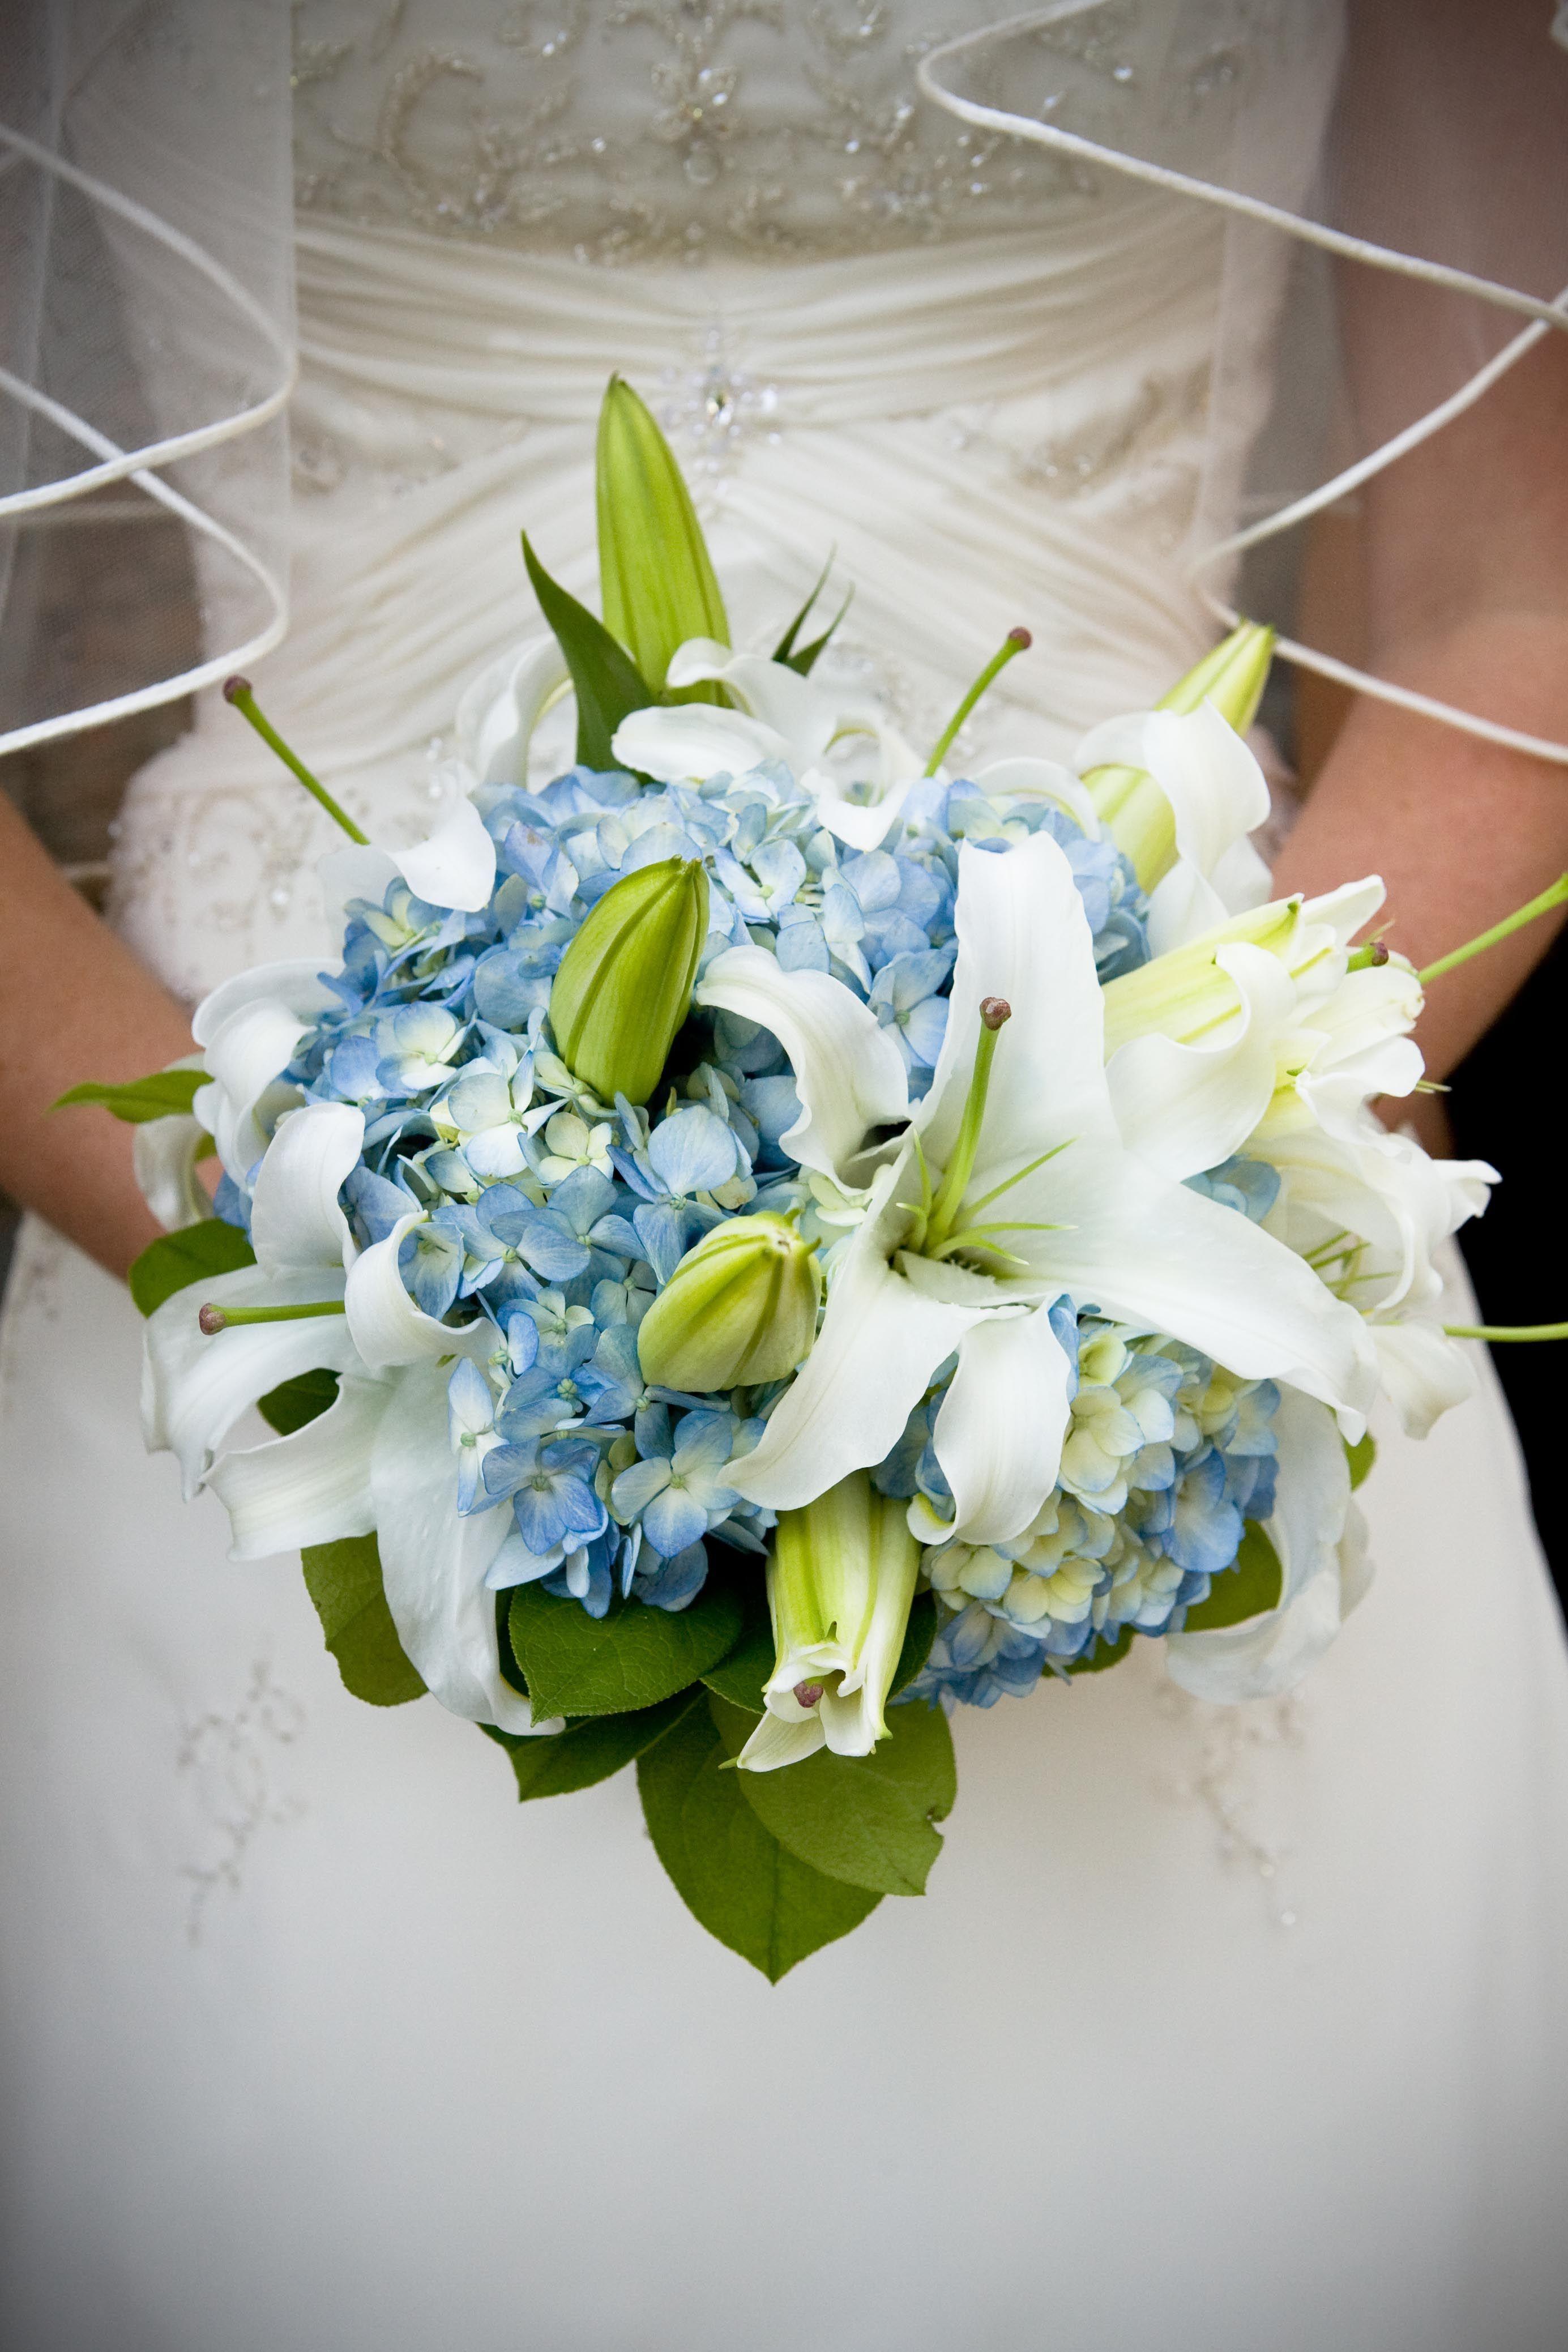 Blue Hydrangea And Oriental Lily Bride Hydrangeas Wedding Hydrangea Bouquet Wedding Blue Hydrangea Bouquet